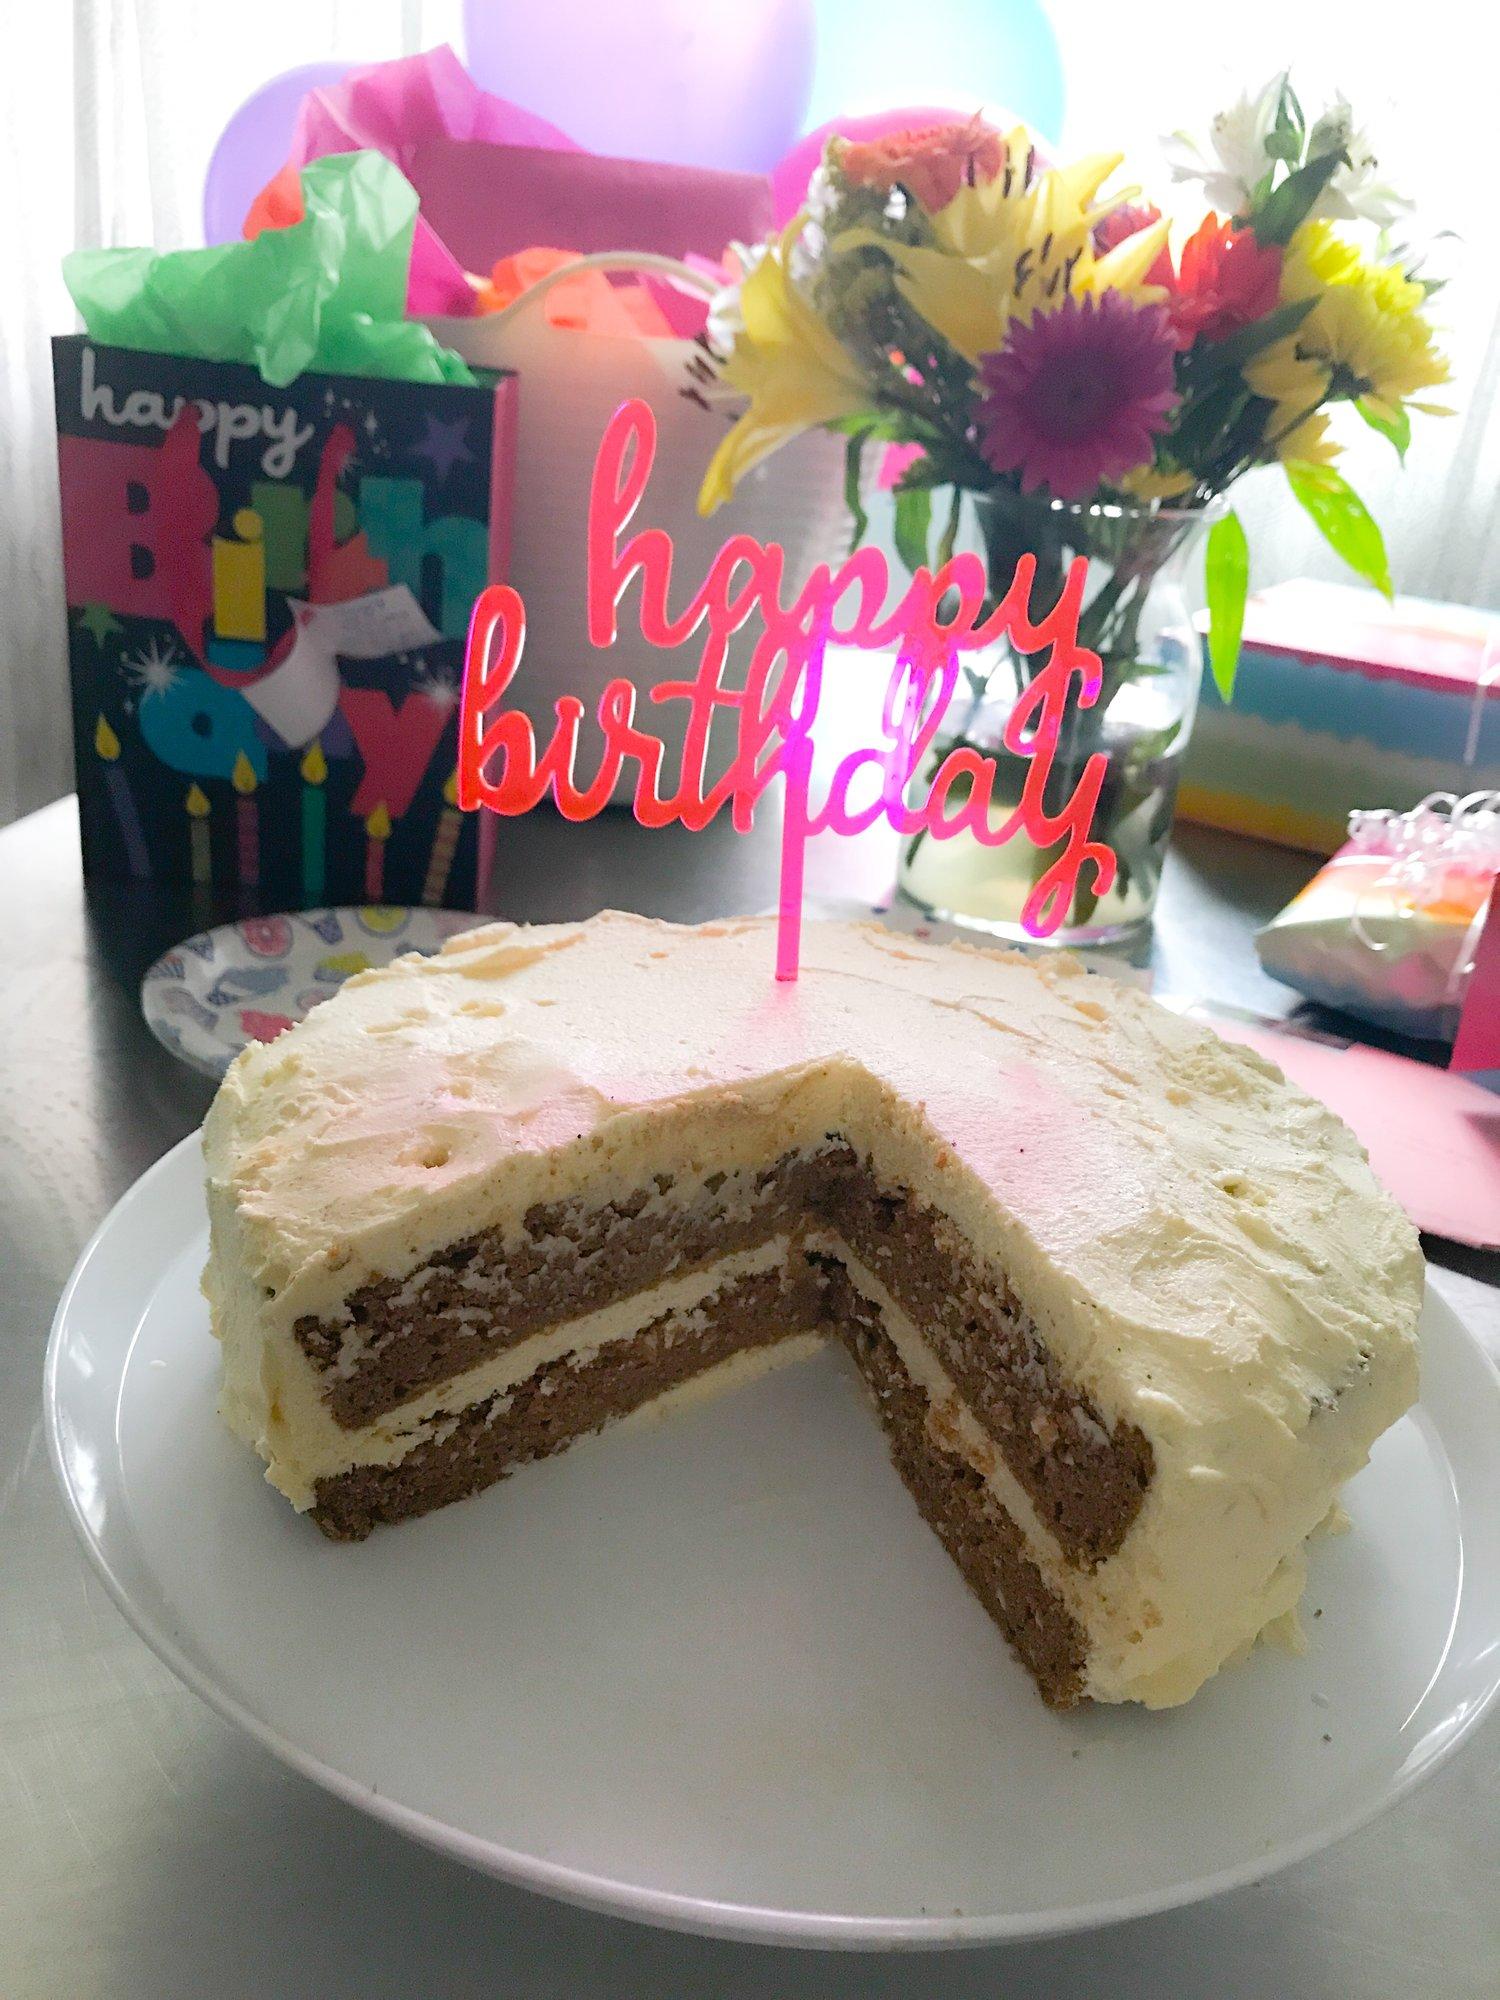 KETO PUMPKIN CAKE WITH KETO BUTTERCREAM FROSTING!